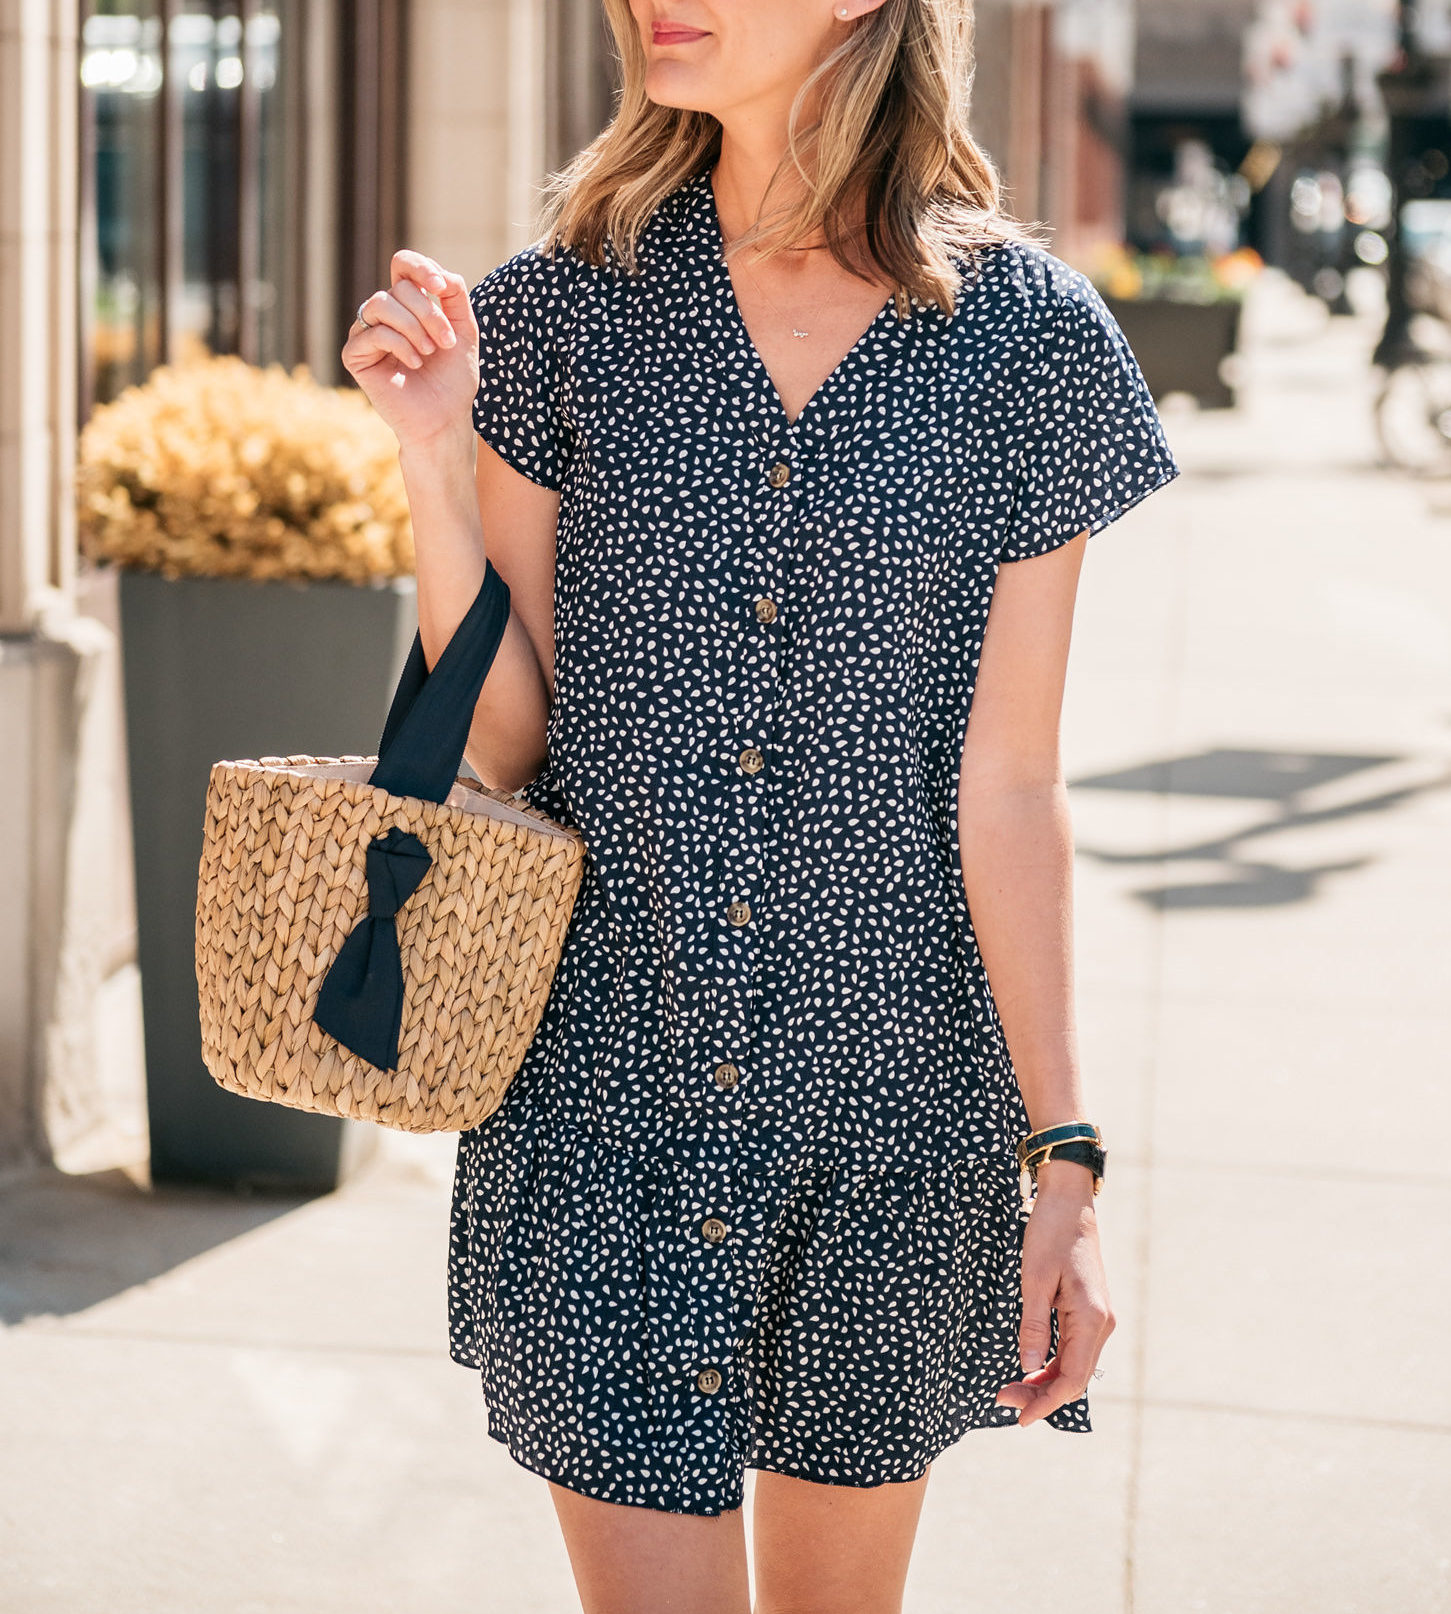 amazon $25 dress